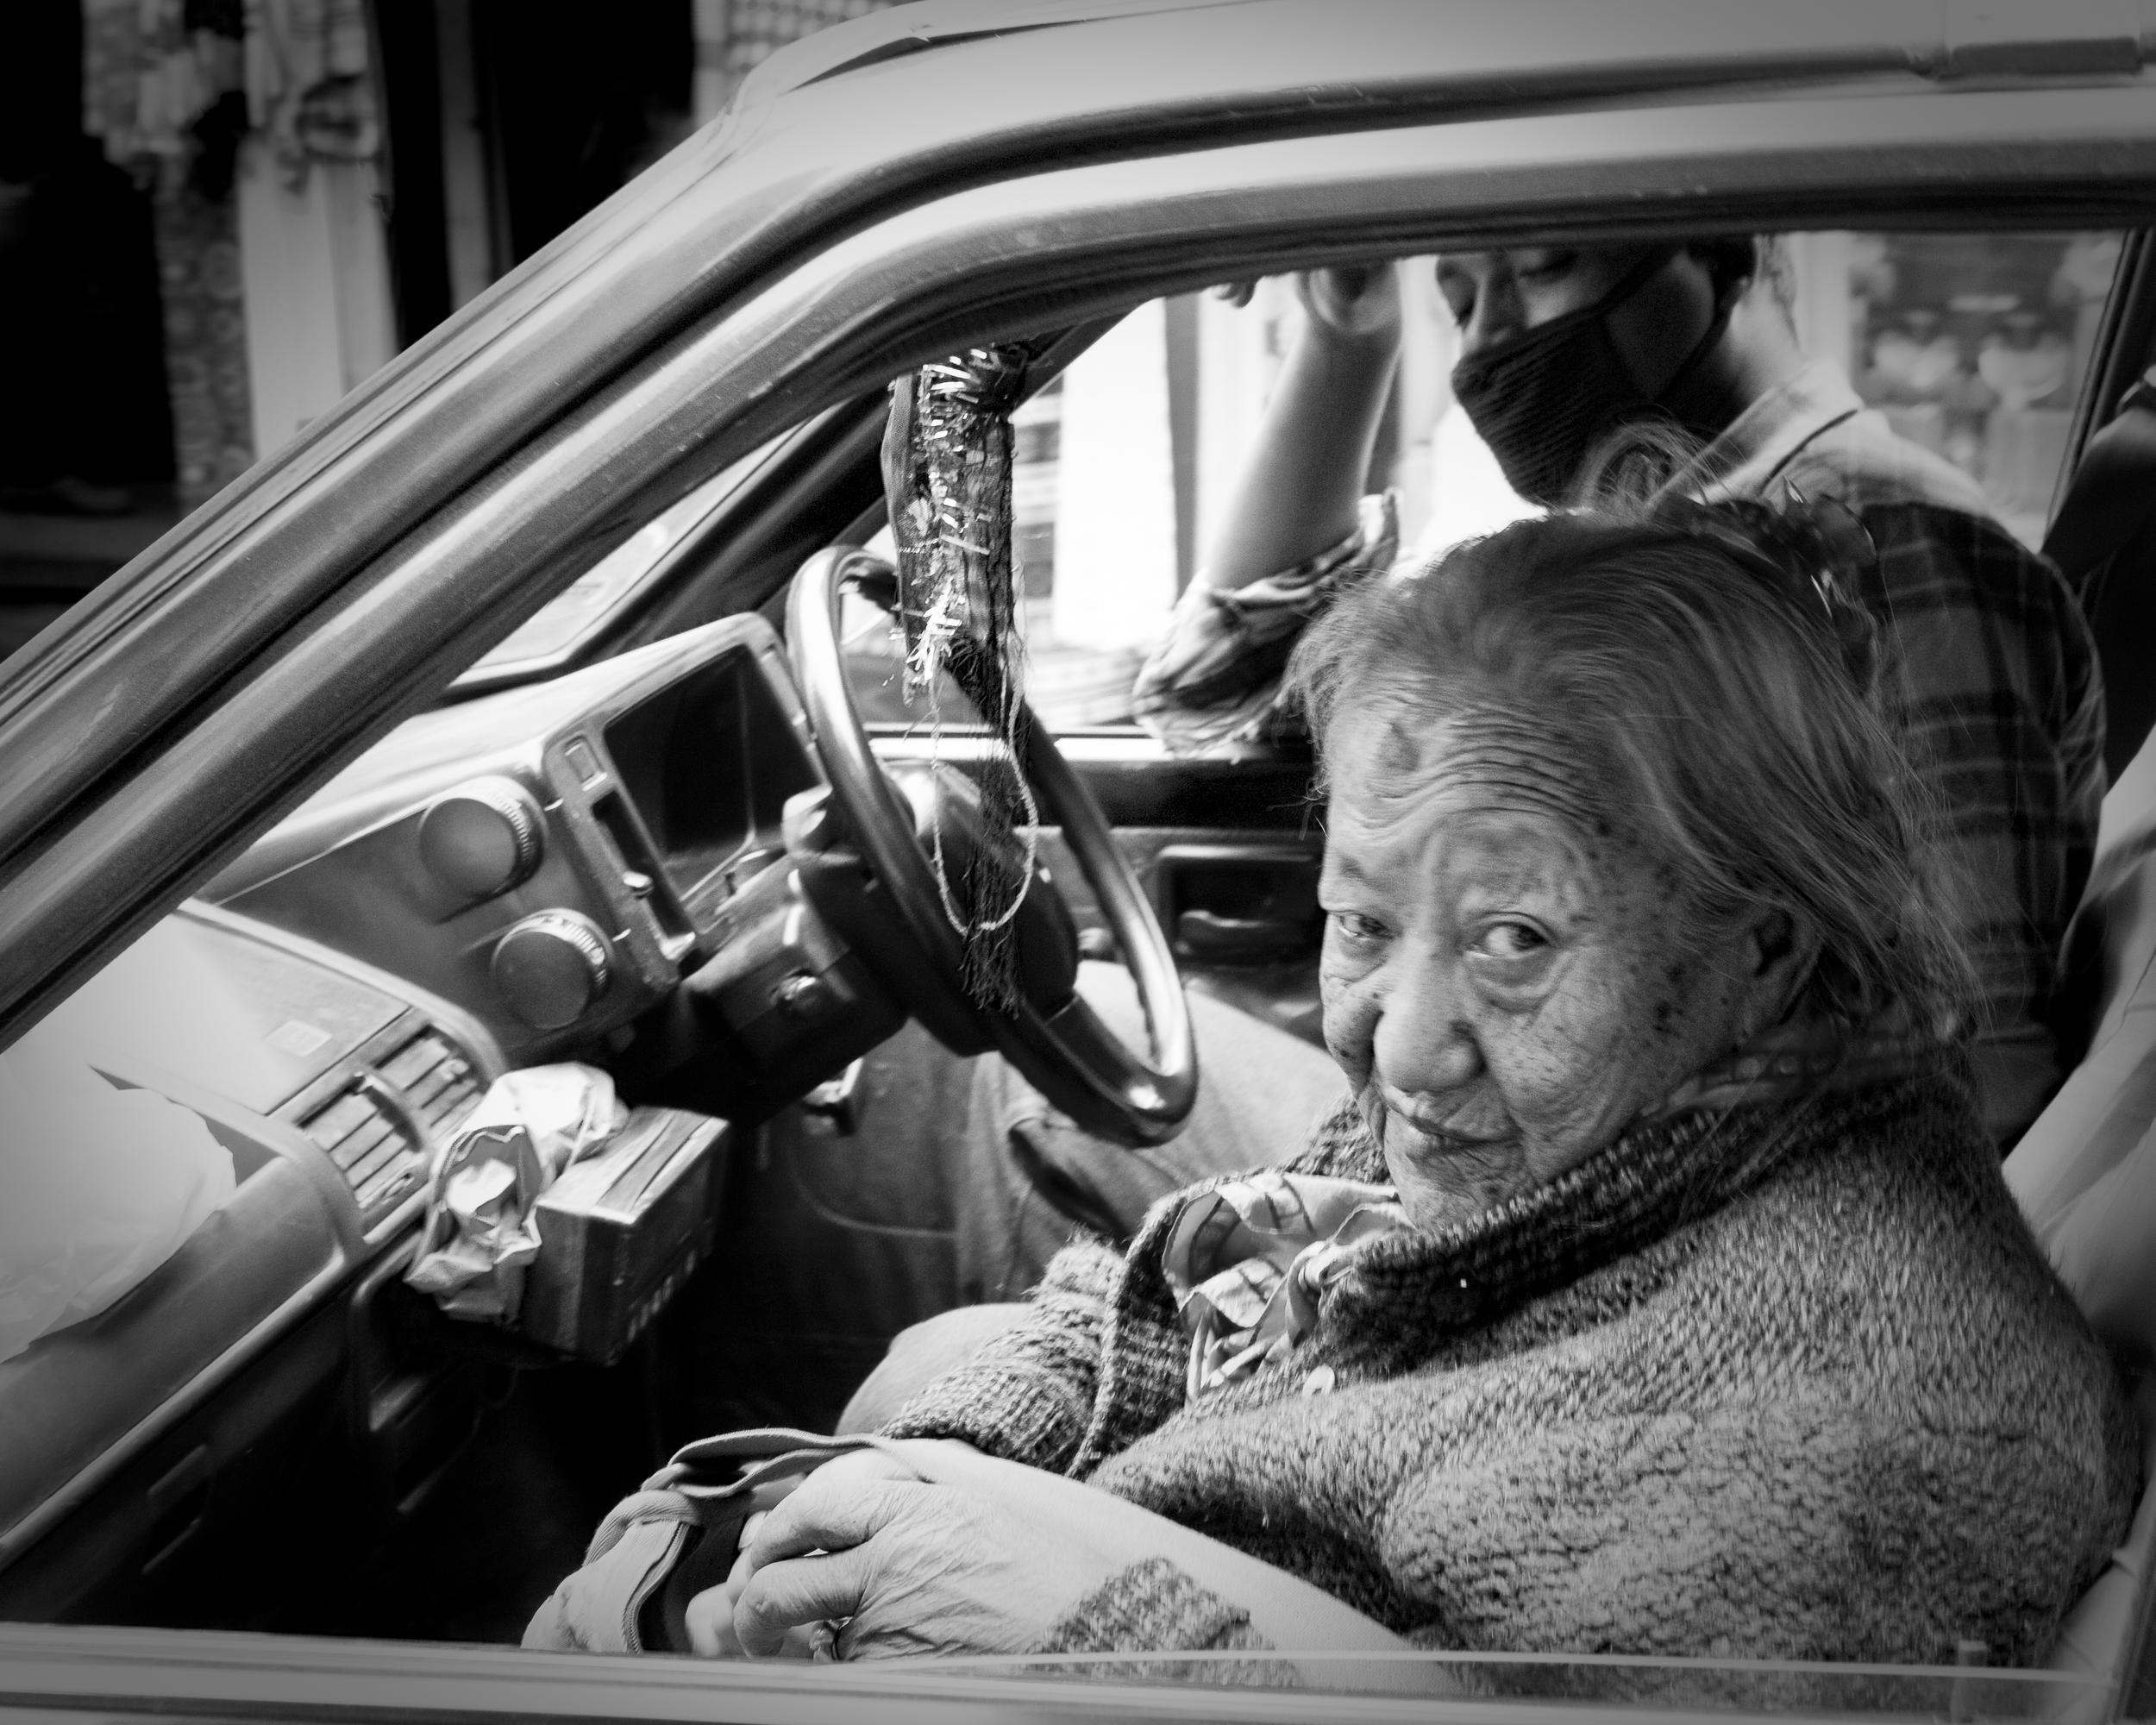 Taxi_woman 8x10 (1 of 1).jpg